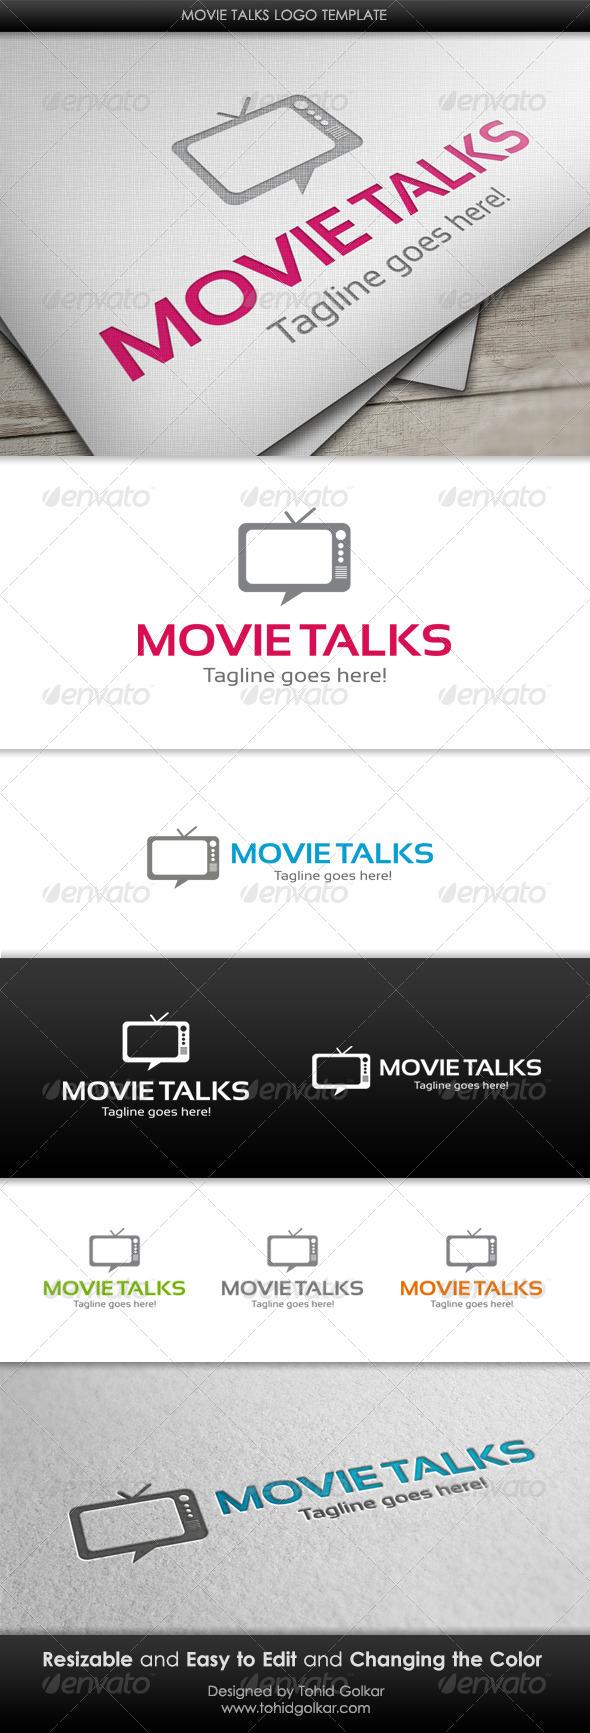 Movie Talks Logo Template